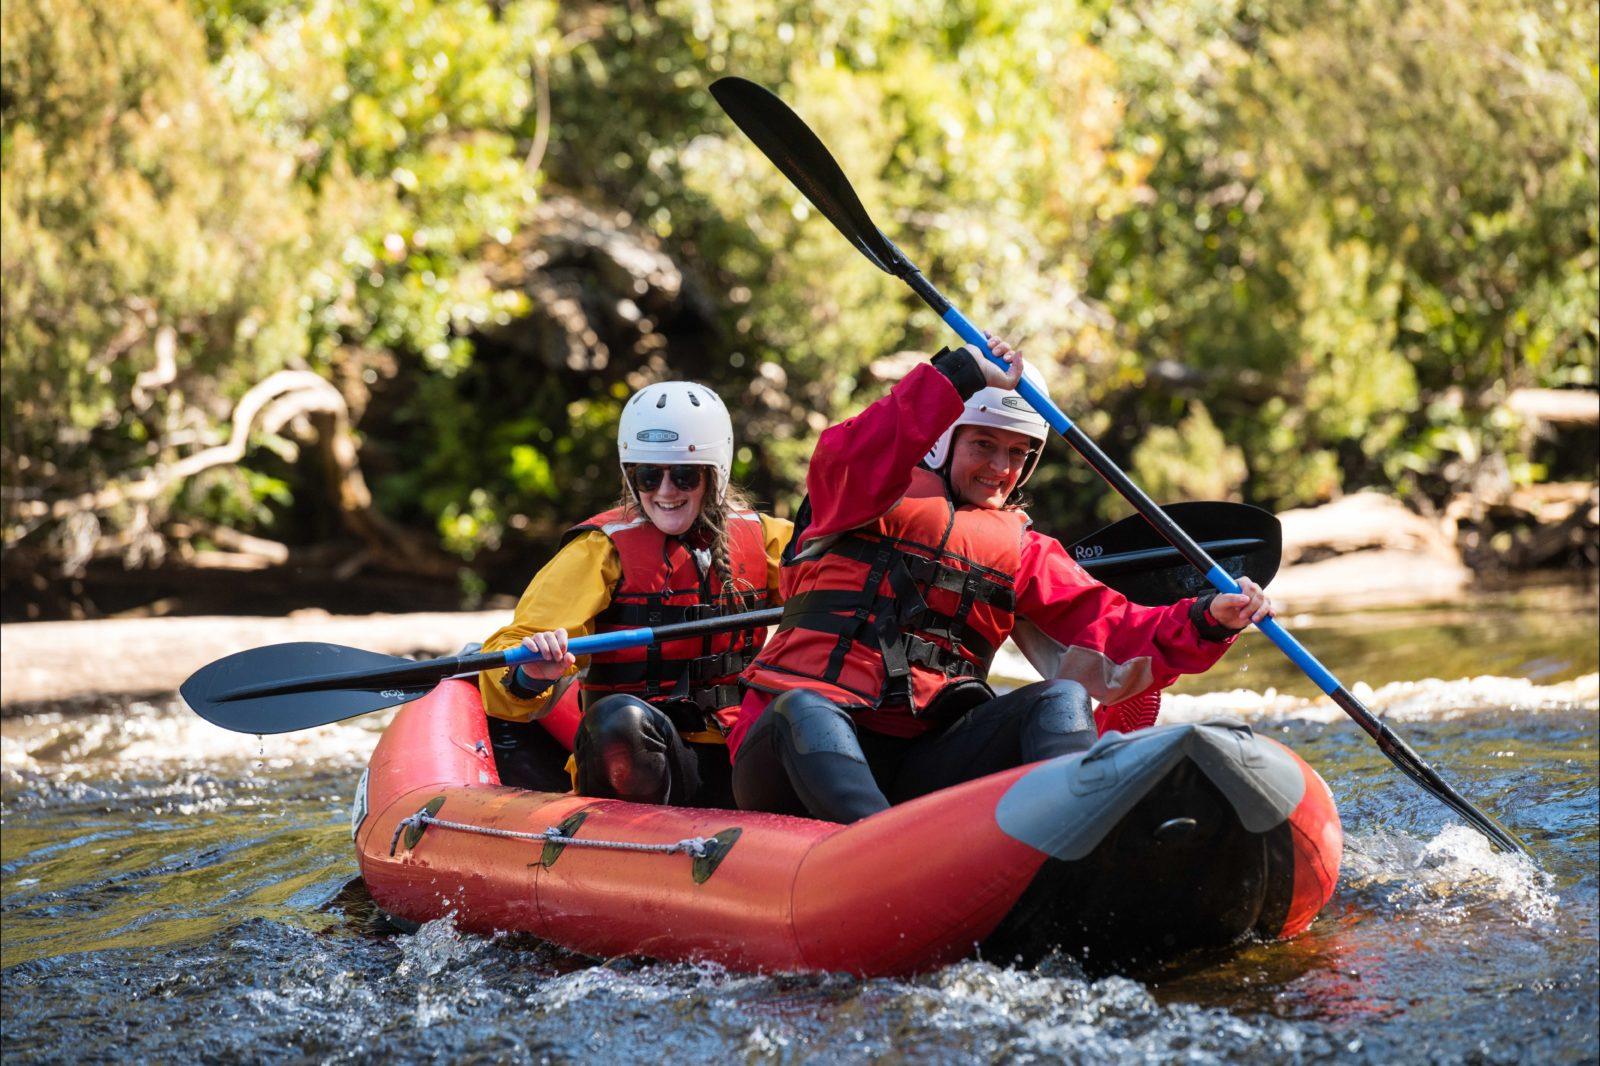 Picton River Tasmania - Twin Rivers Adventure